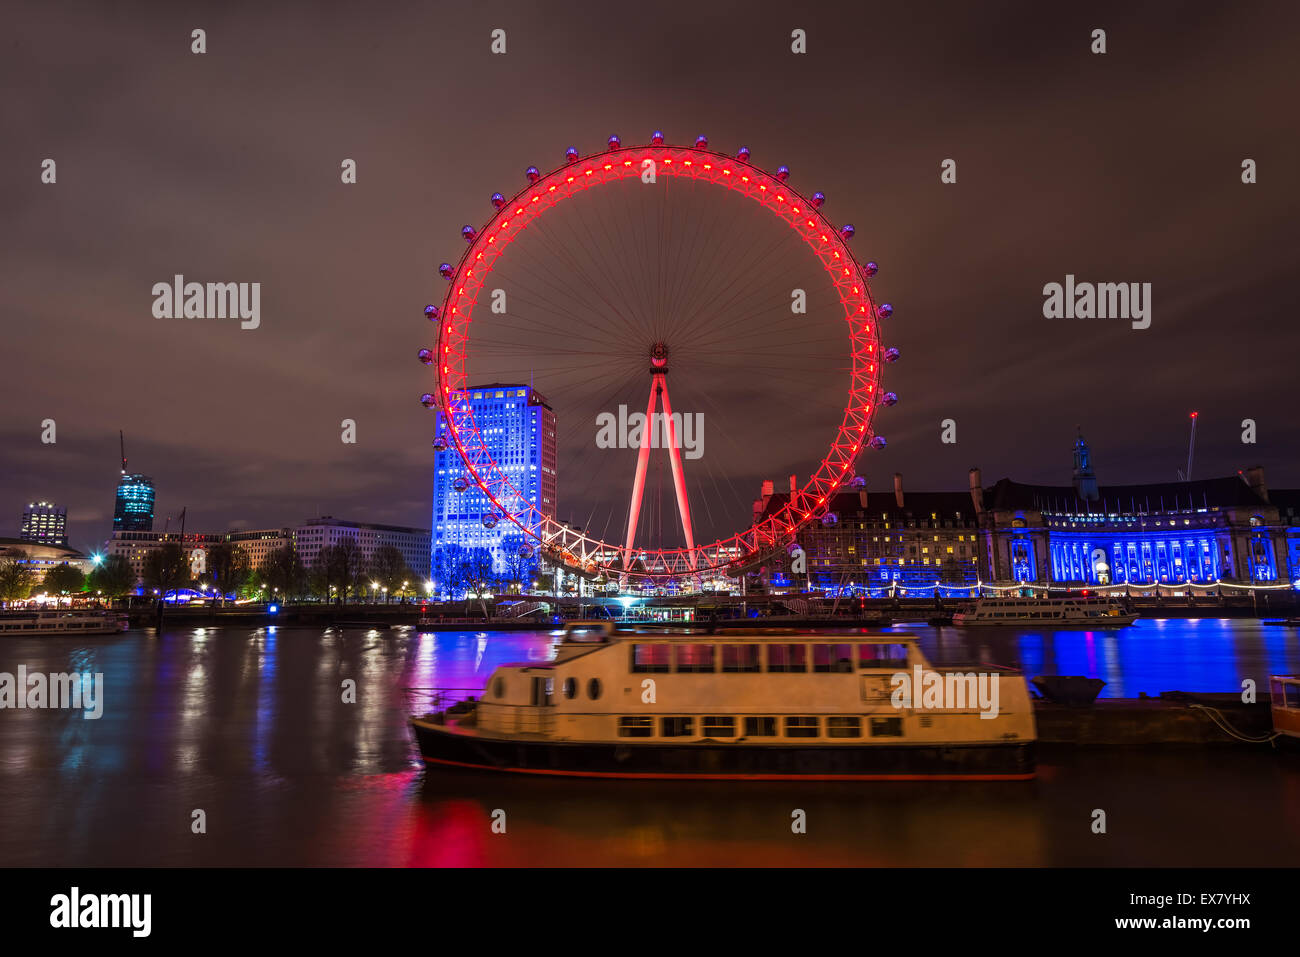 El London Eye de noche Foto de stock